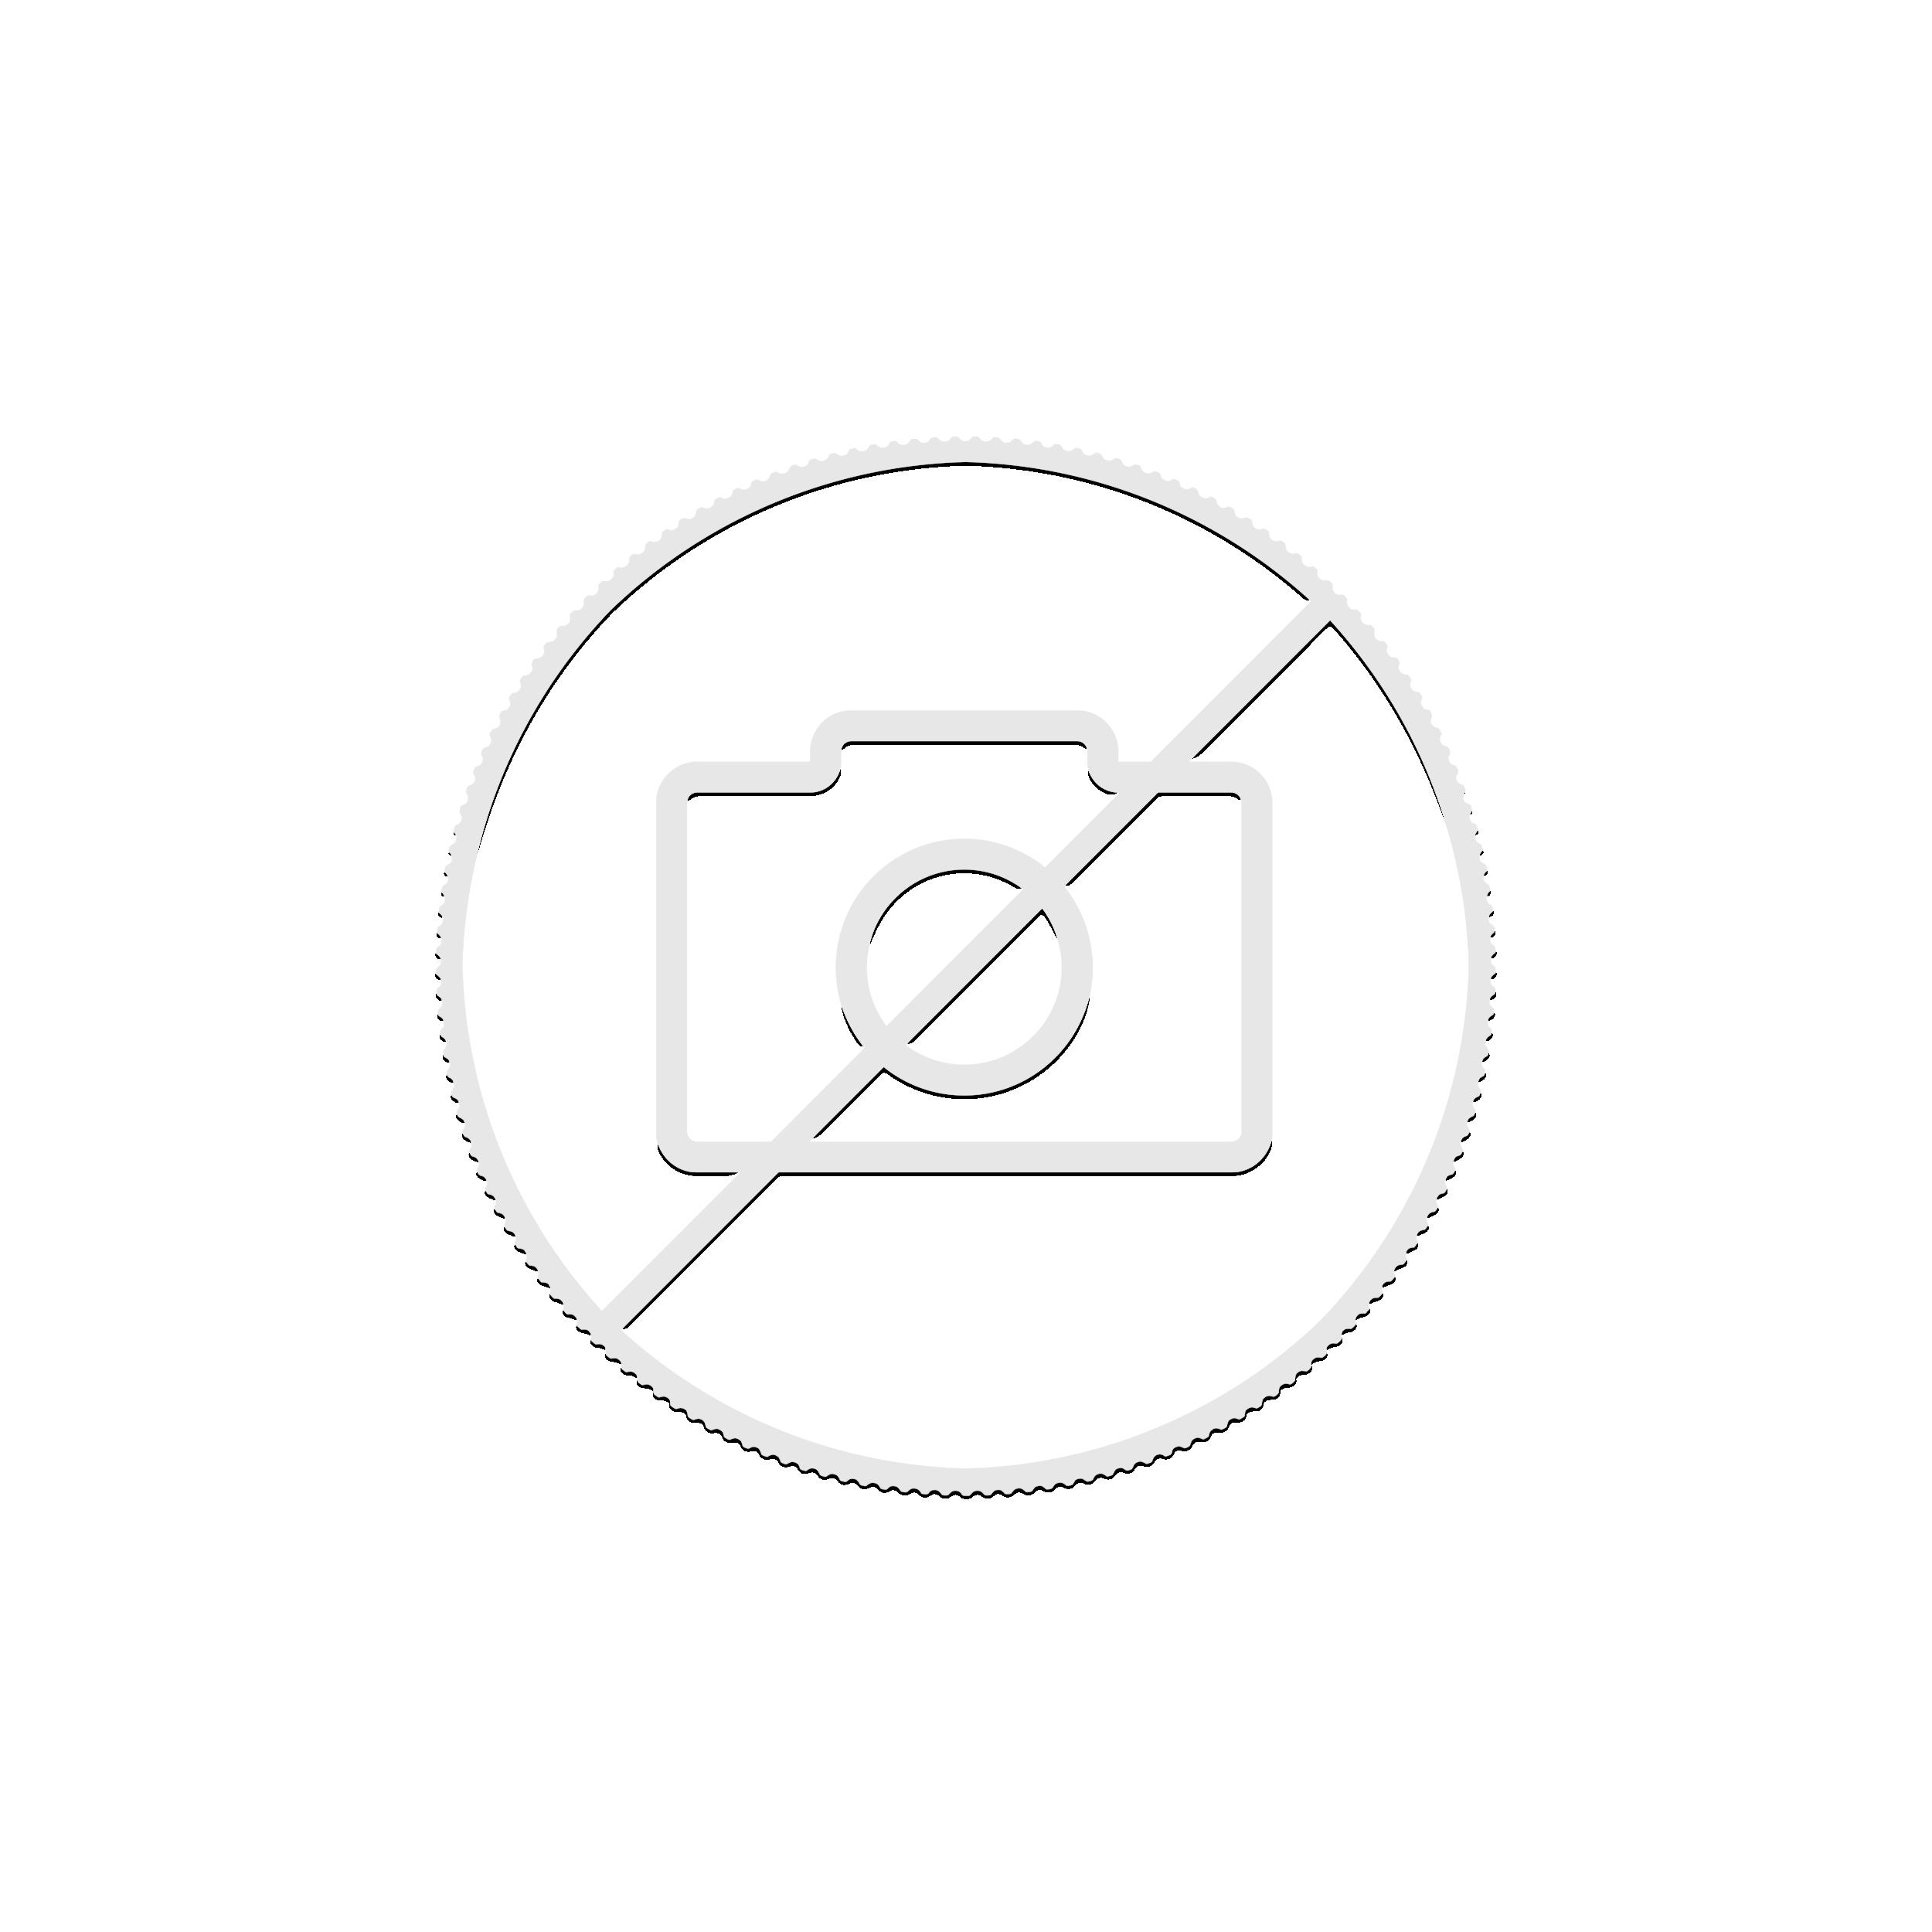 1 Troy ounce zilveren munt Leeuwendaalder 2018 Proof